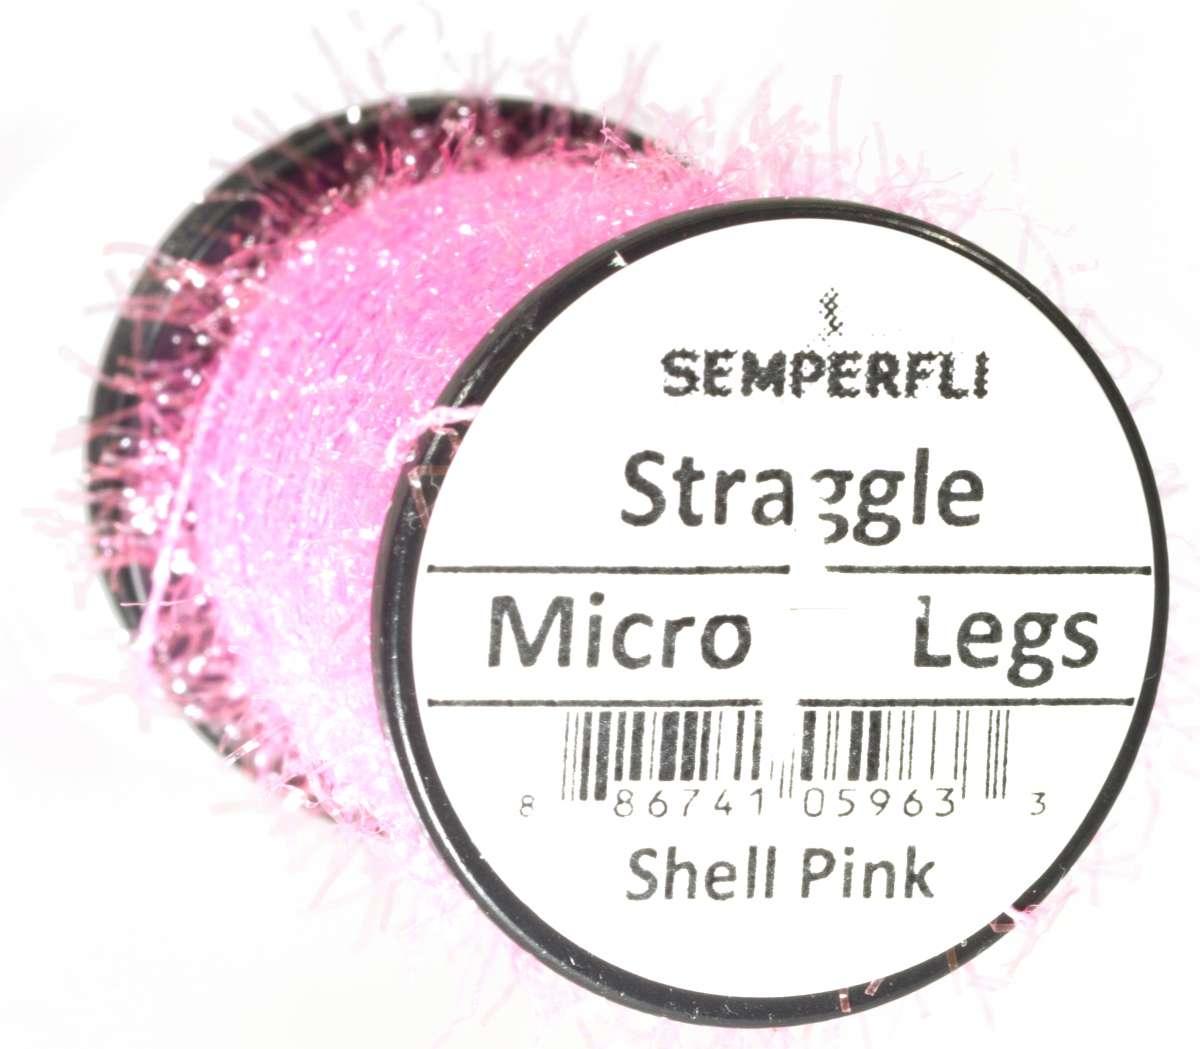 Straggle Legs Sem-0200-sp